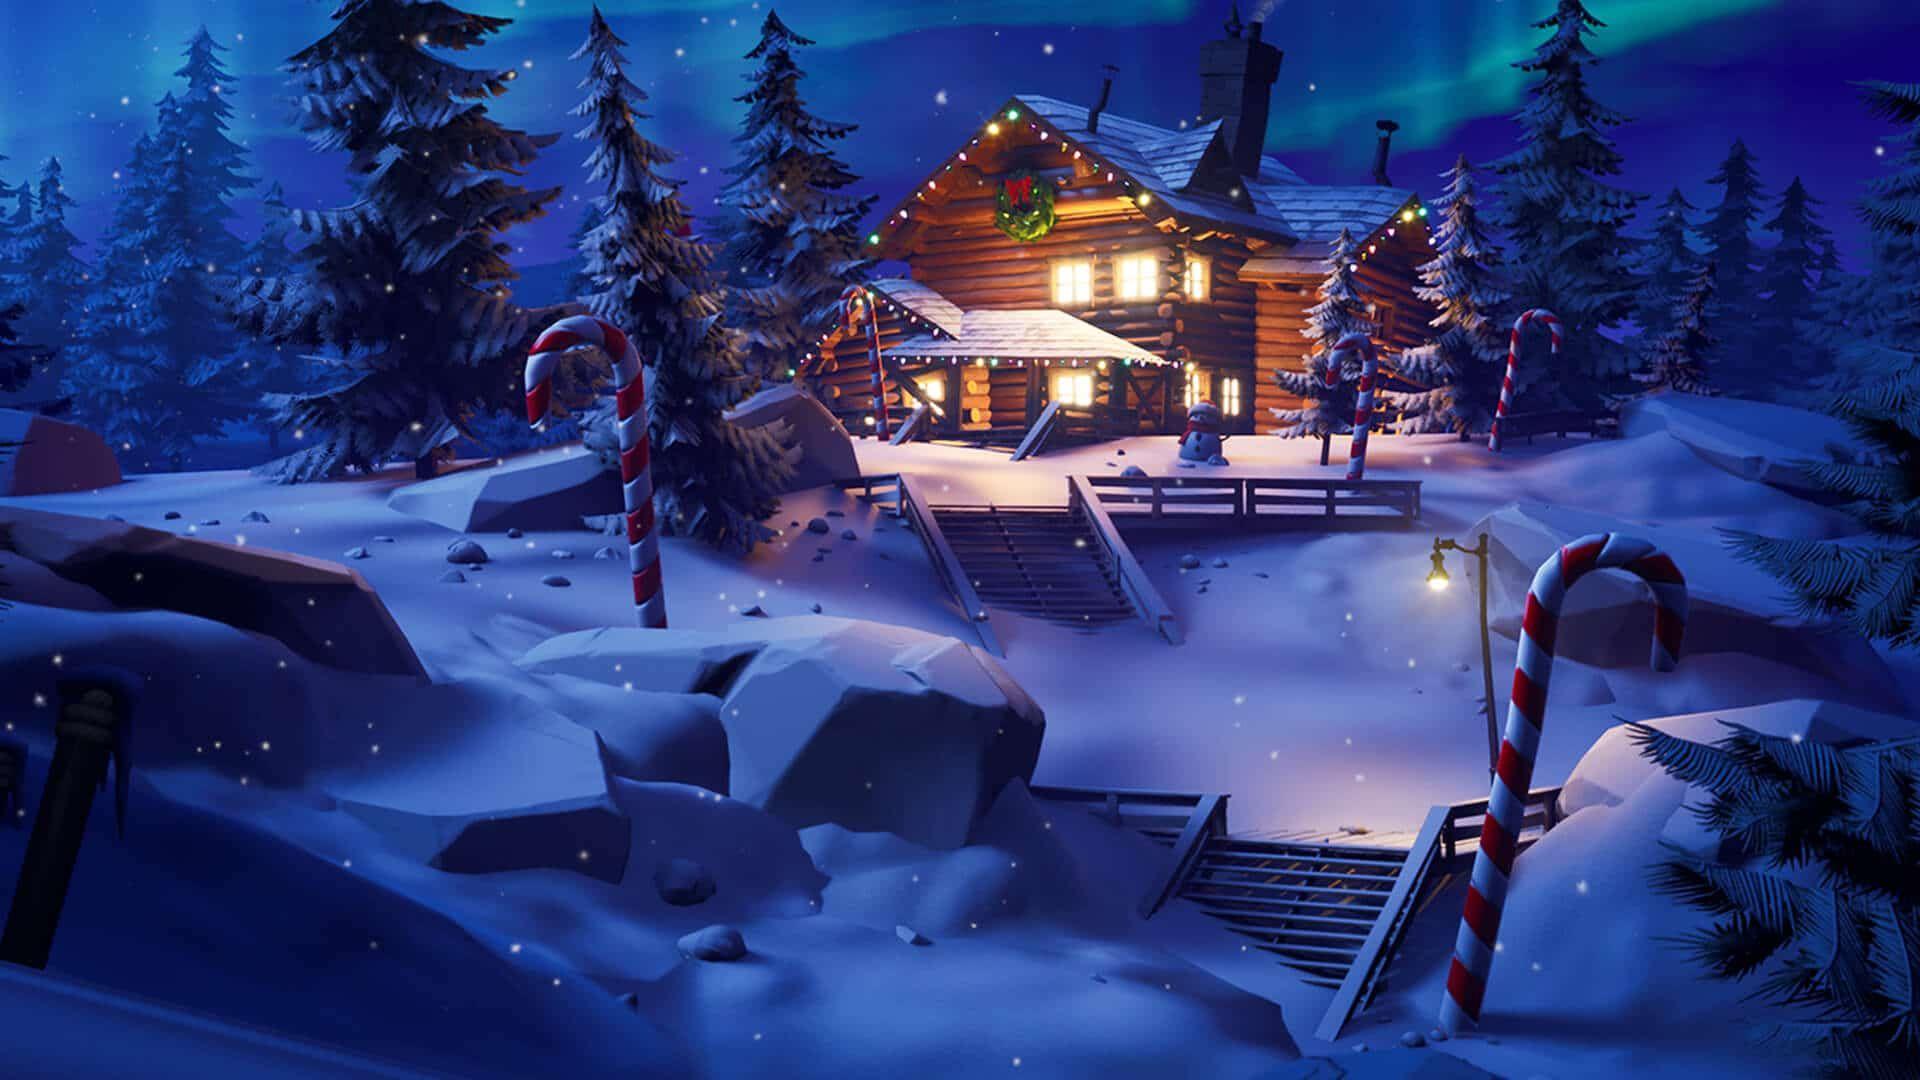 Full Screen Fortnite Christmas Wallpaper Hd